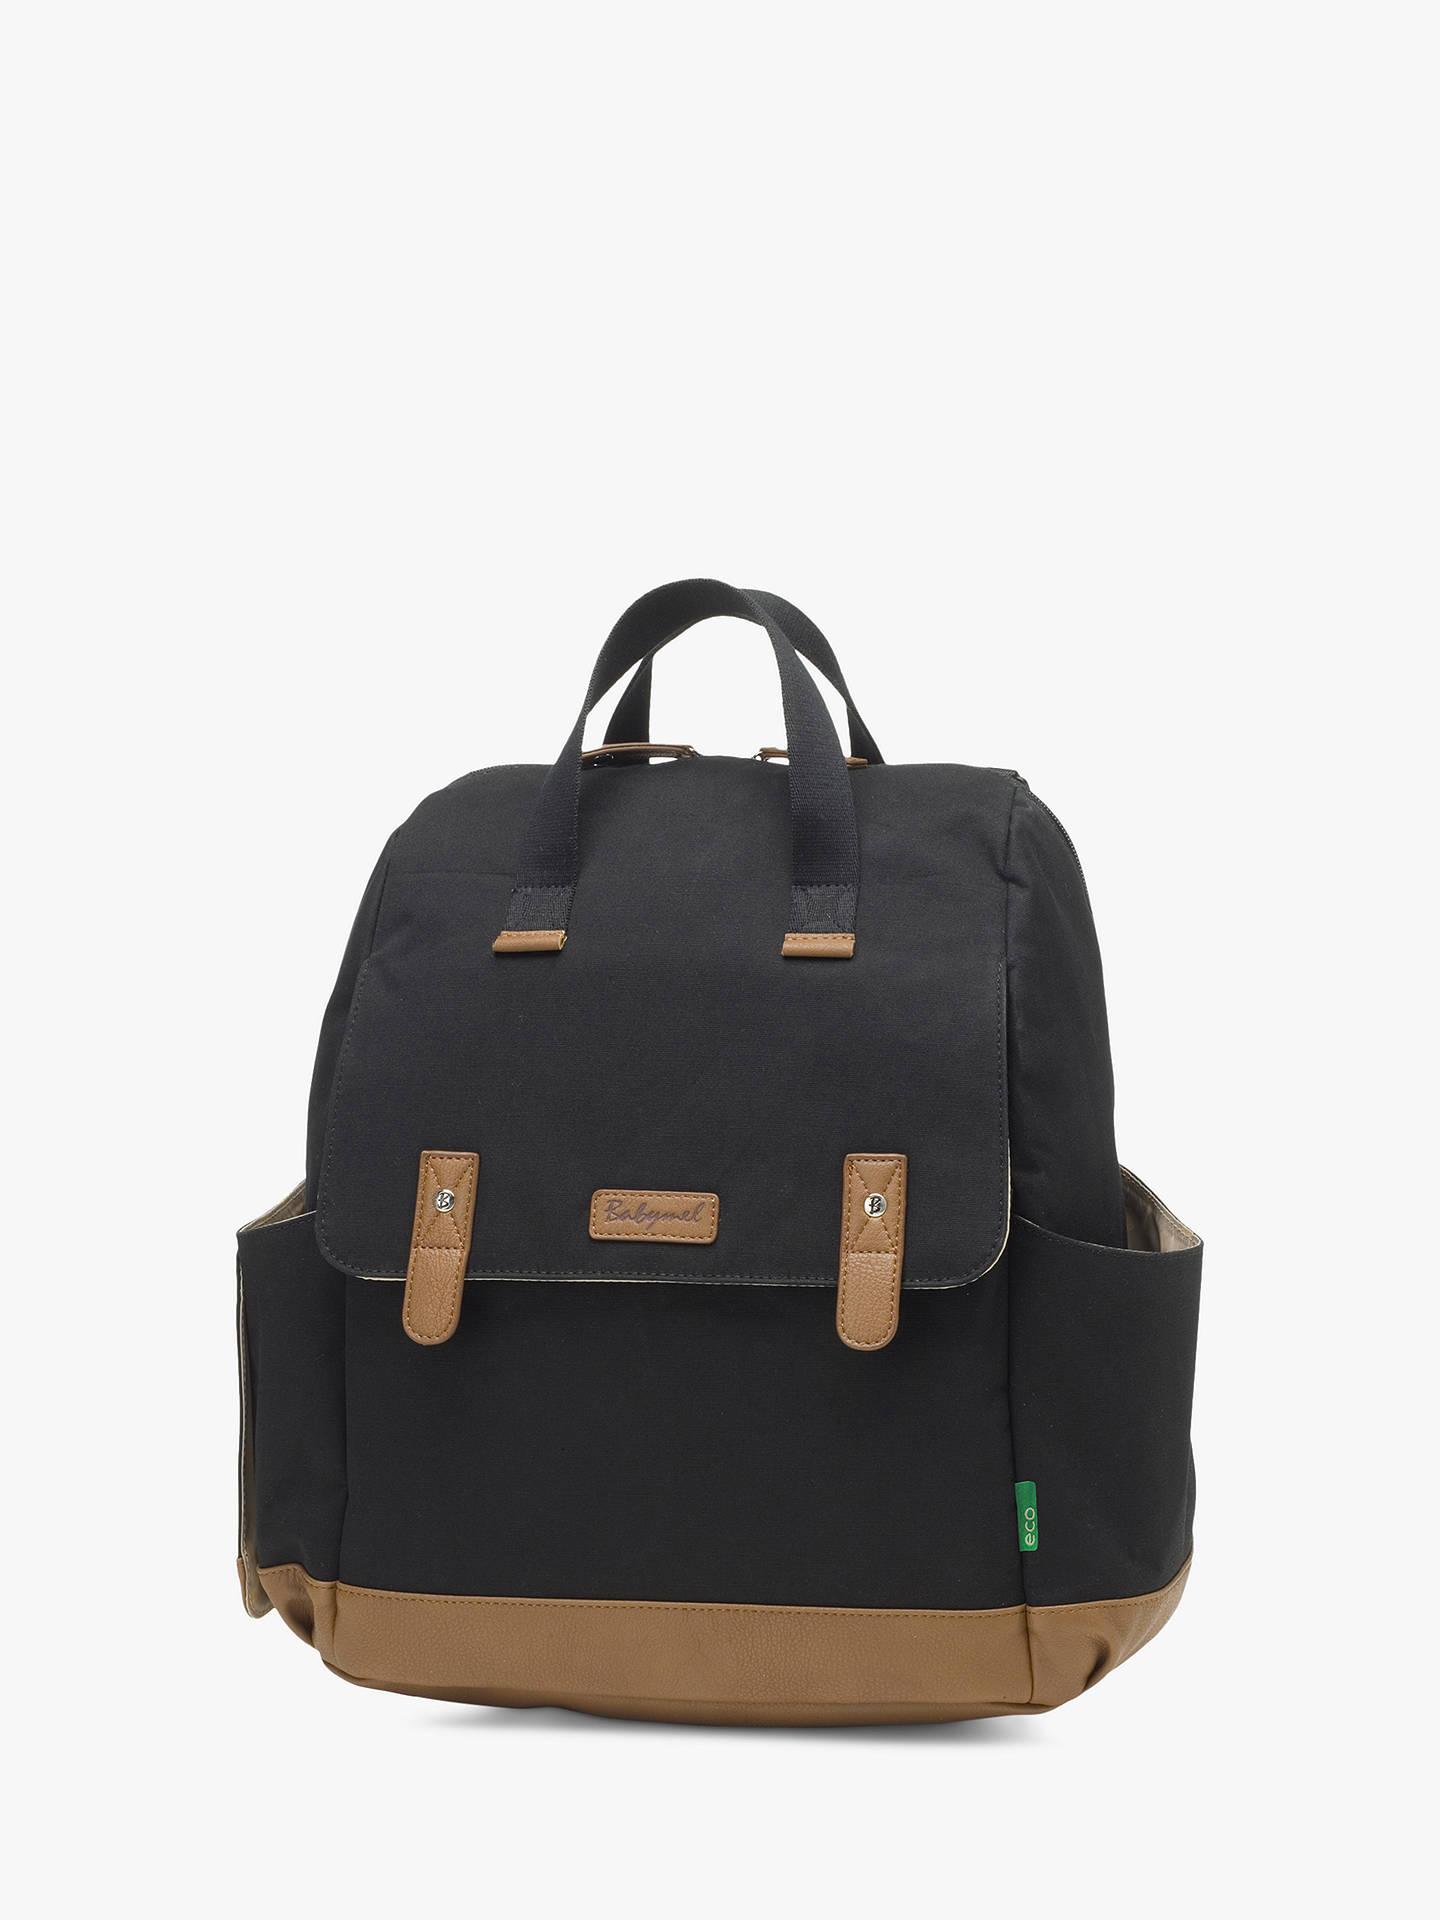 BuyBabymel Robyn Convertible Backpack, Black Online at johnlewis.com ... 6b14e18cea